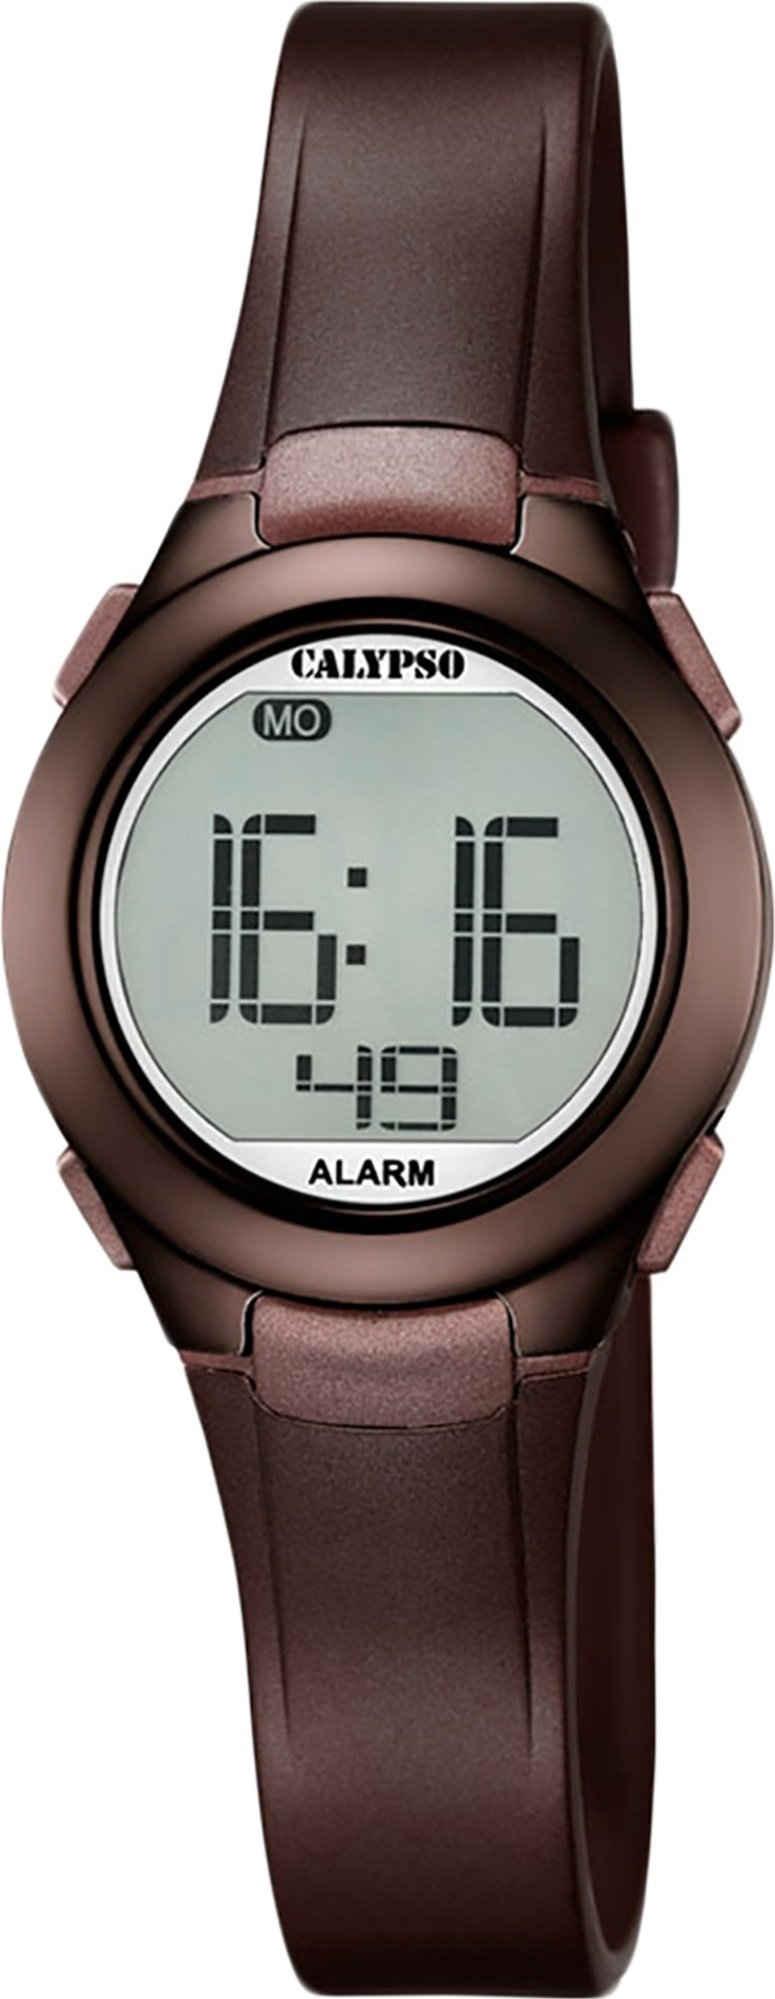 CALYPSO WATCHES Digitaluhr »UK5677/6 Calypso Damen Uhr K5677/6 Kunststoffband«, (Digitaluhr), Damen Armbanduhr rund, PURarmband braun, Sport